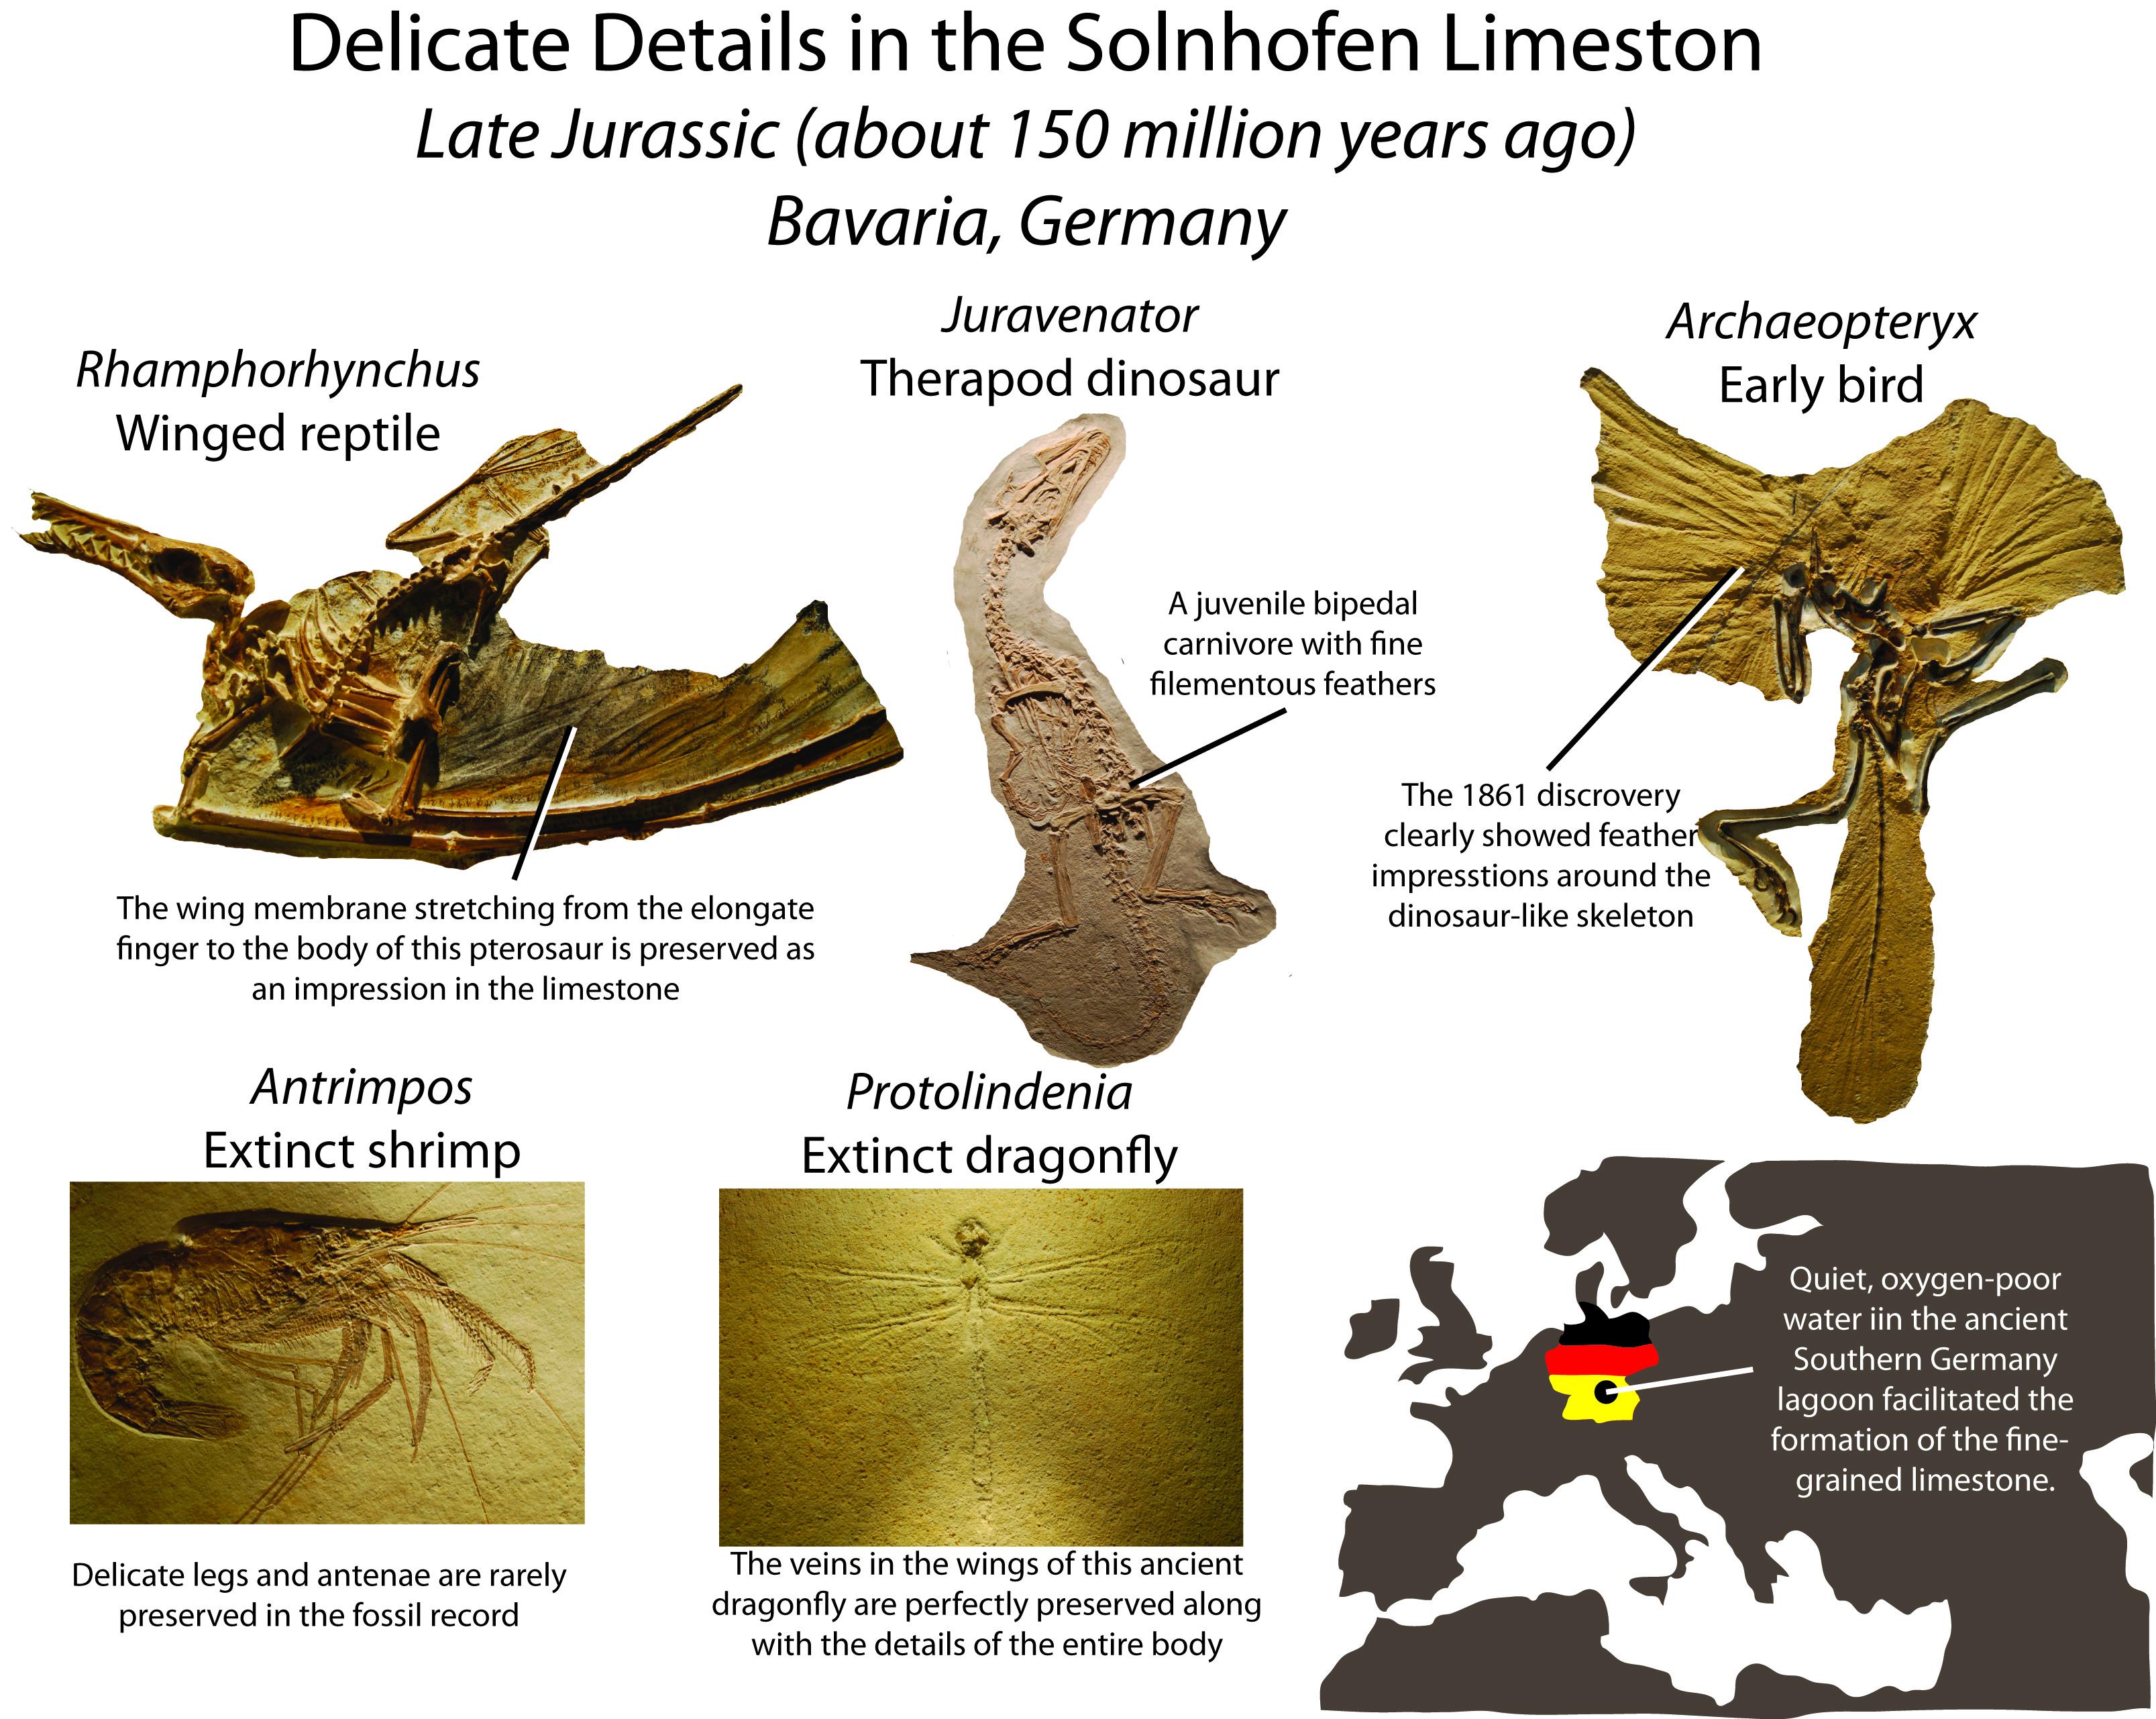 Solhofen fossils